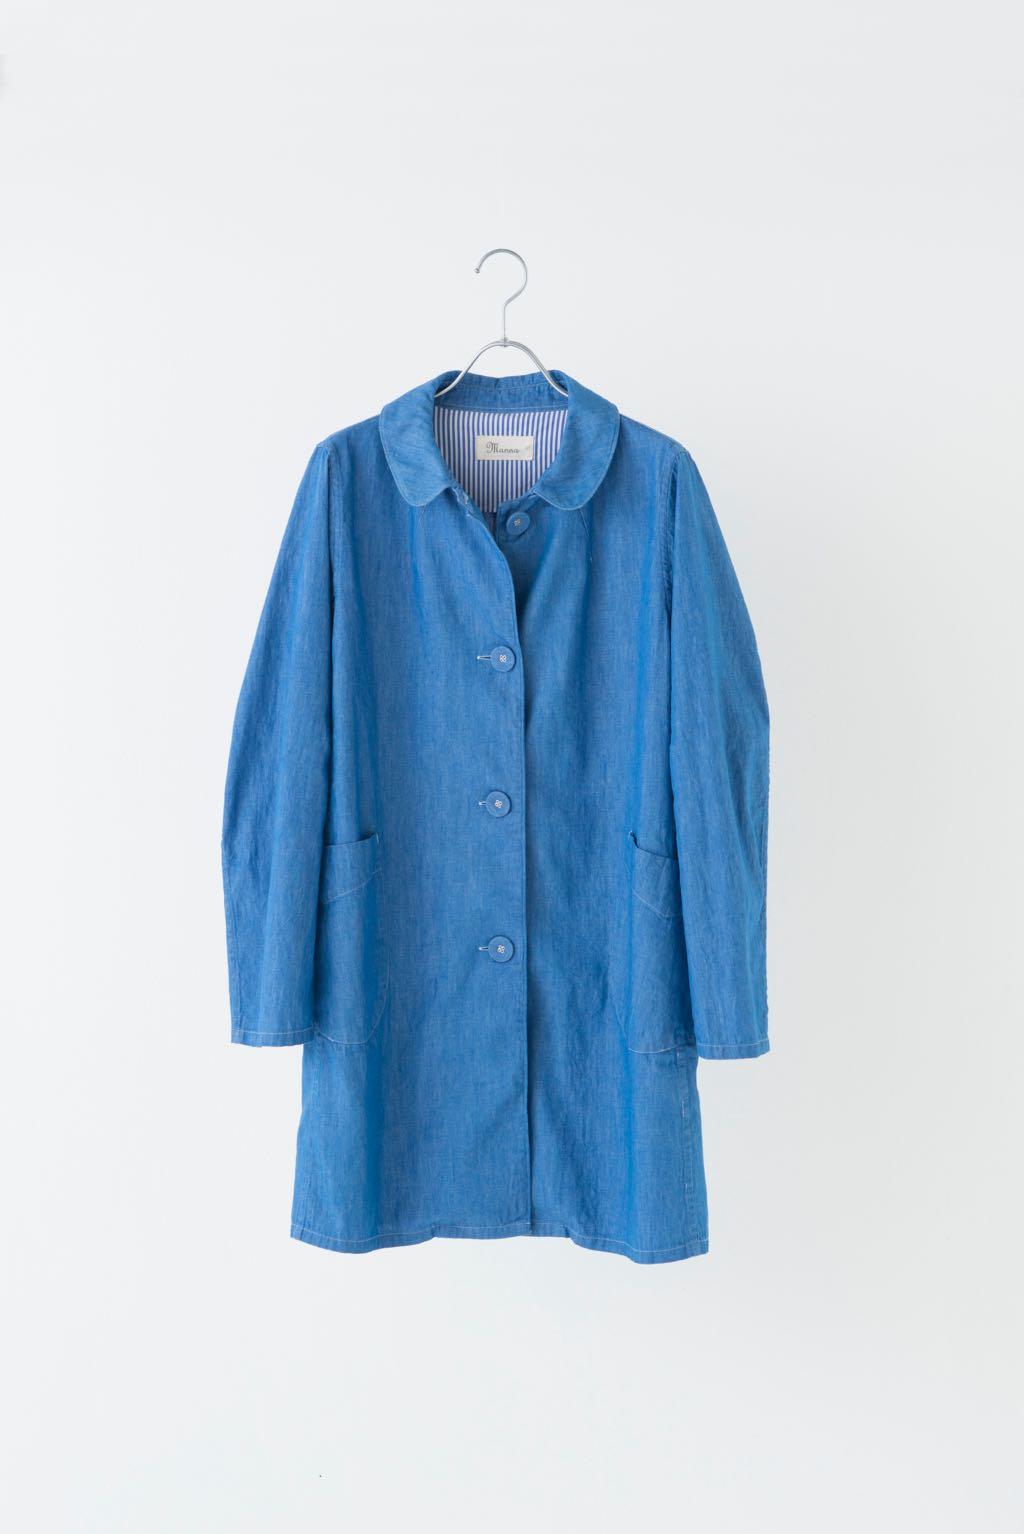 DENIM COAT  171011 ¥27,000+tax